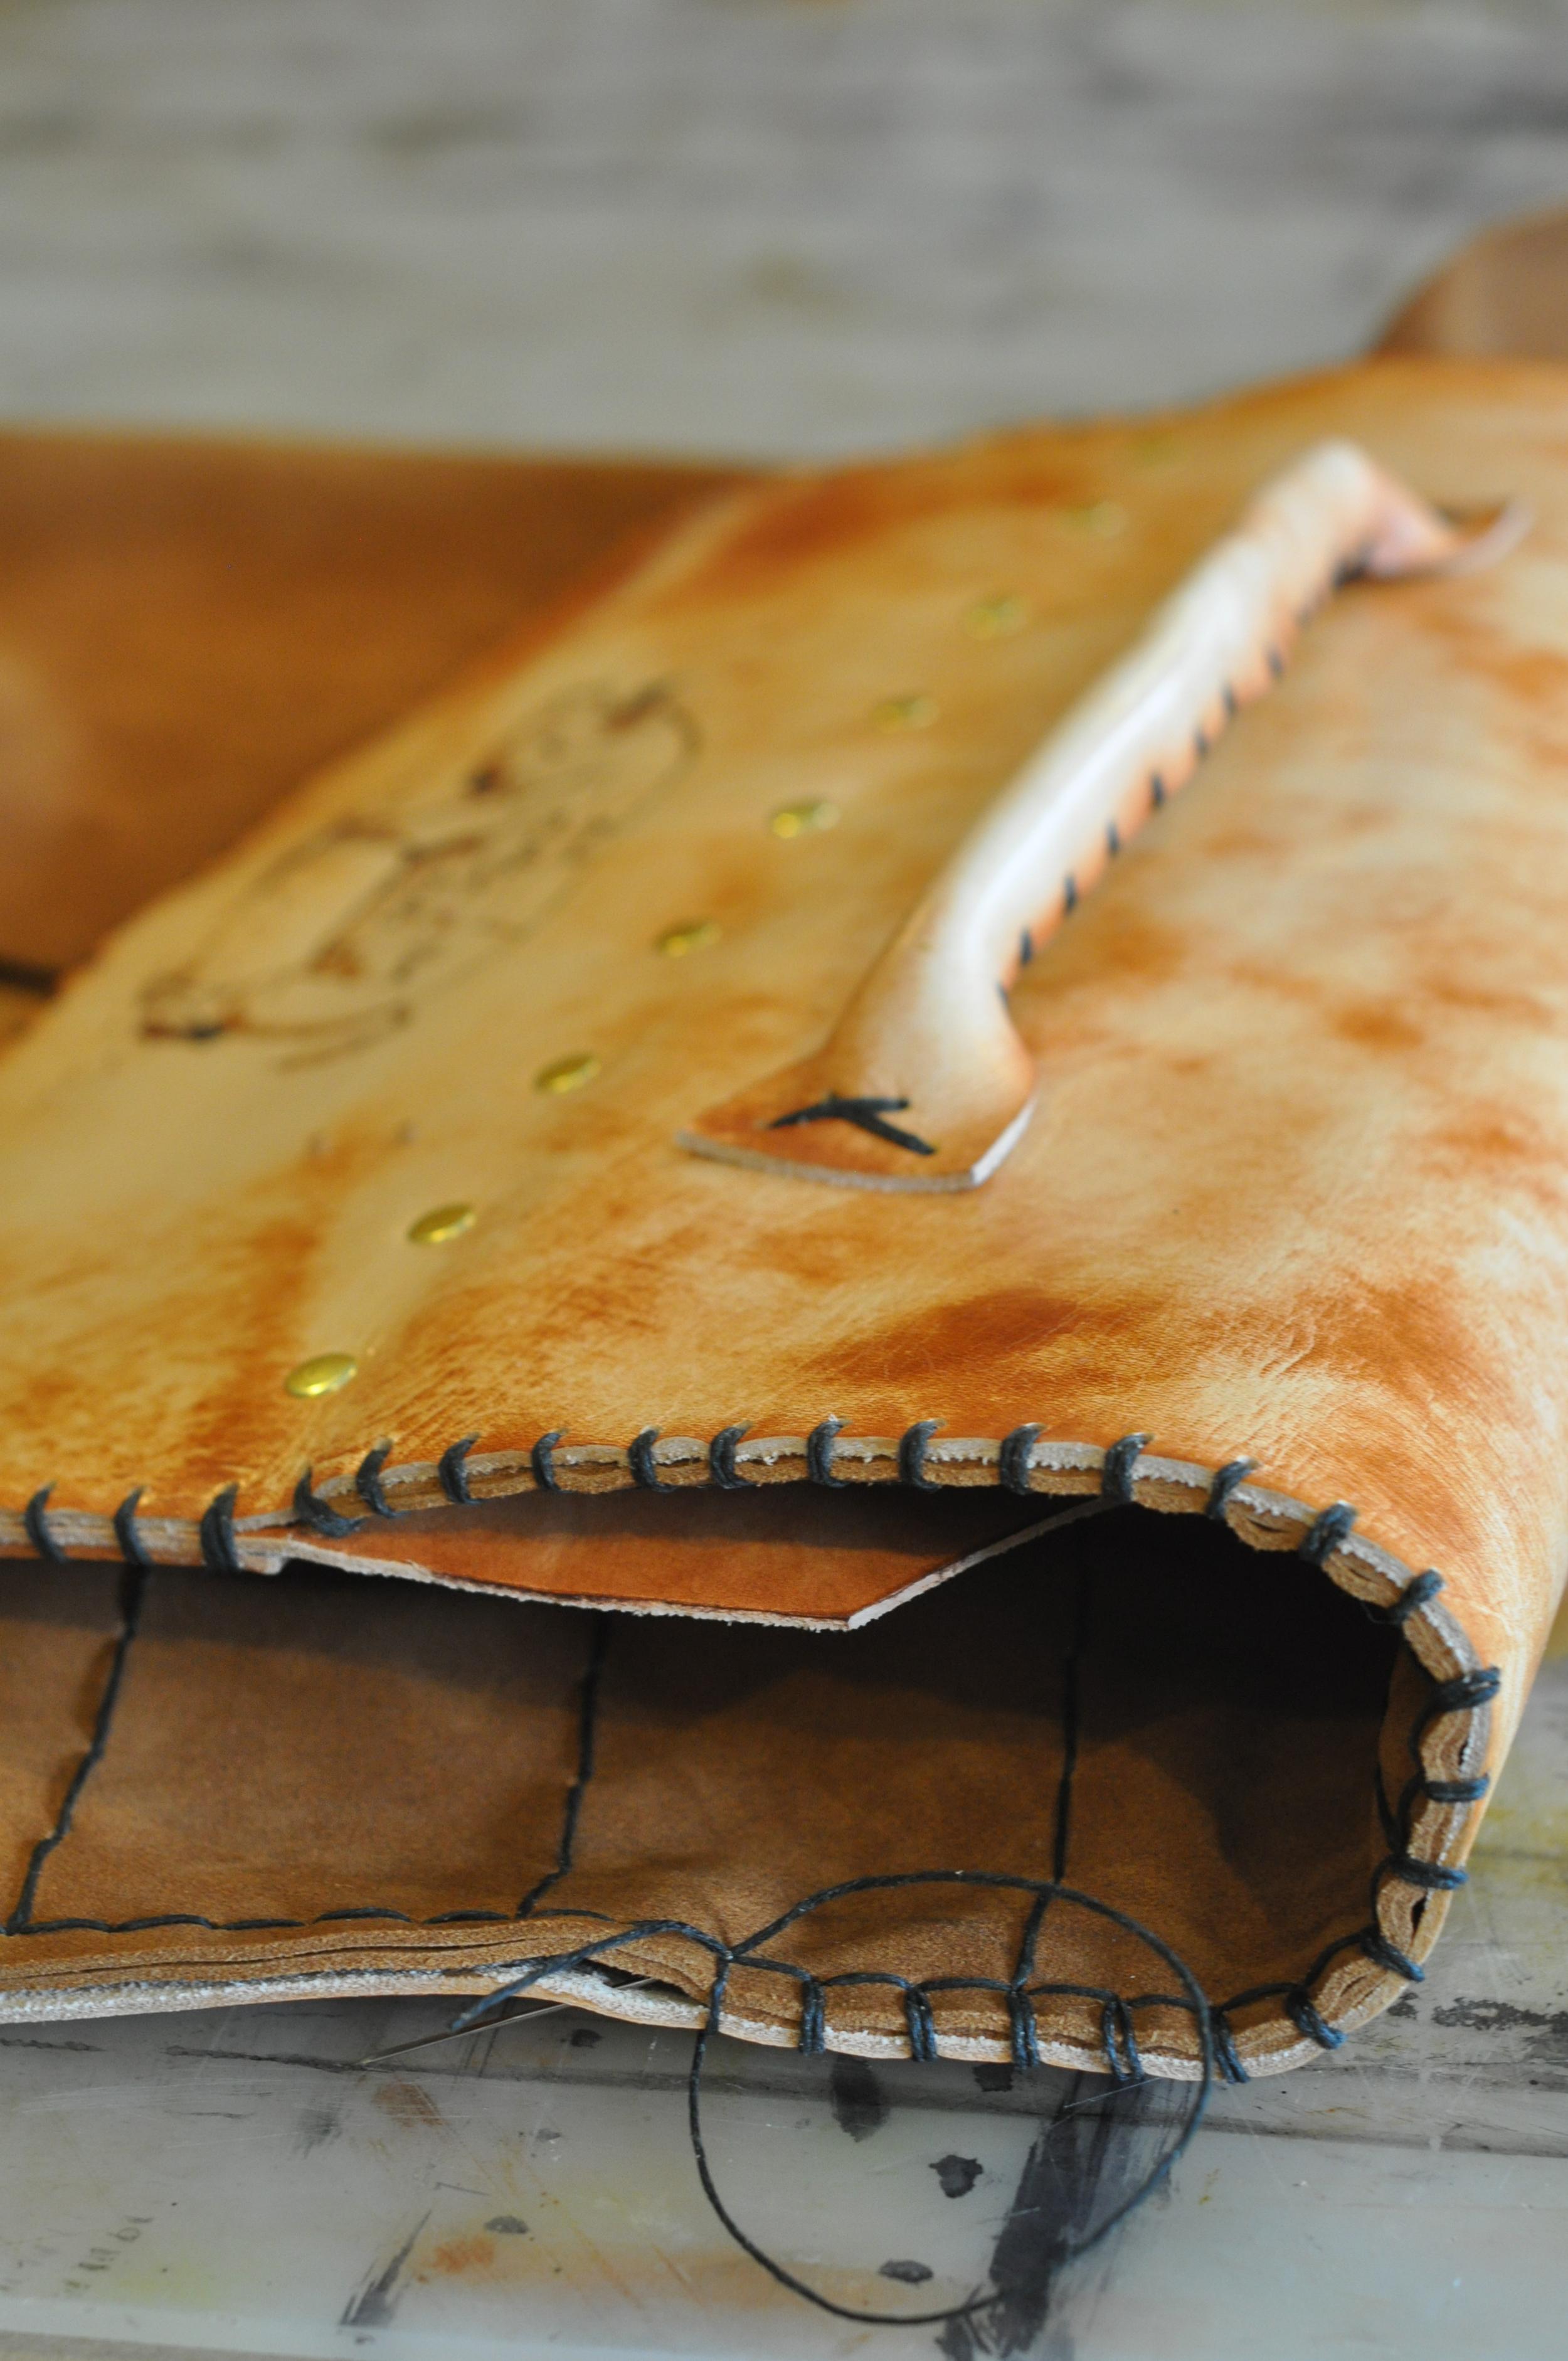 custom leather knife roll